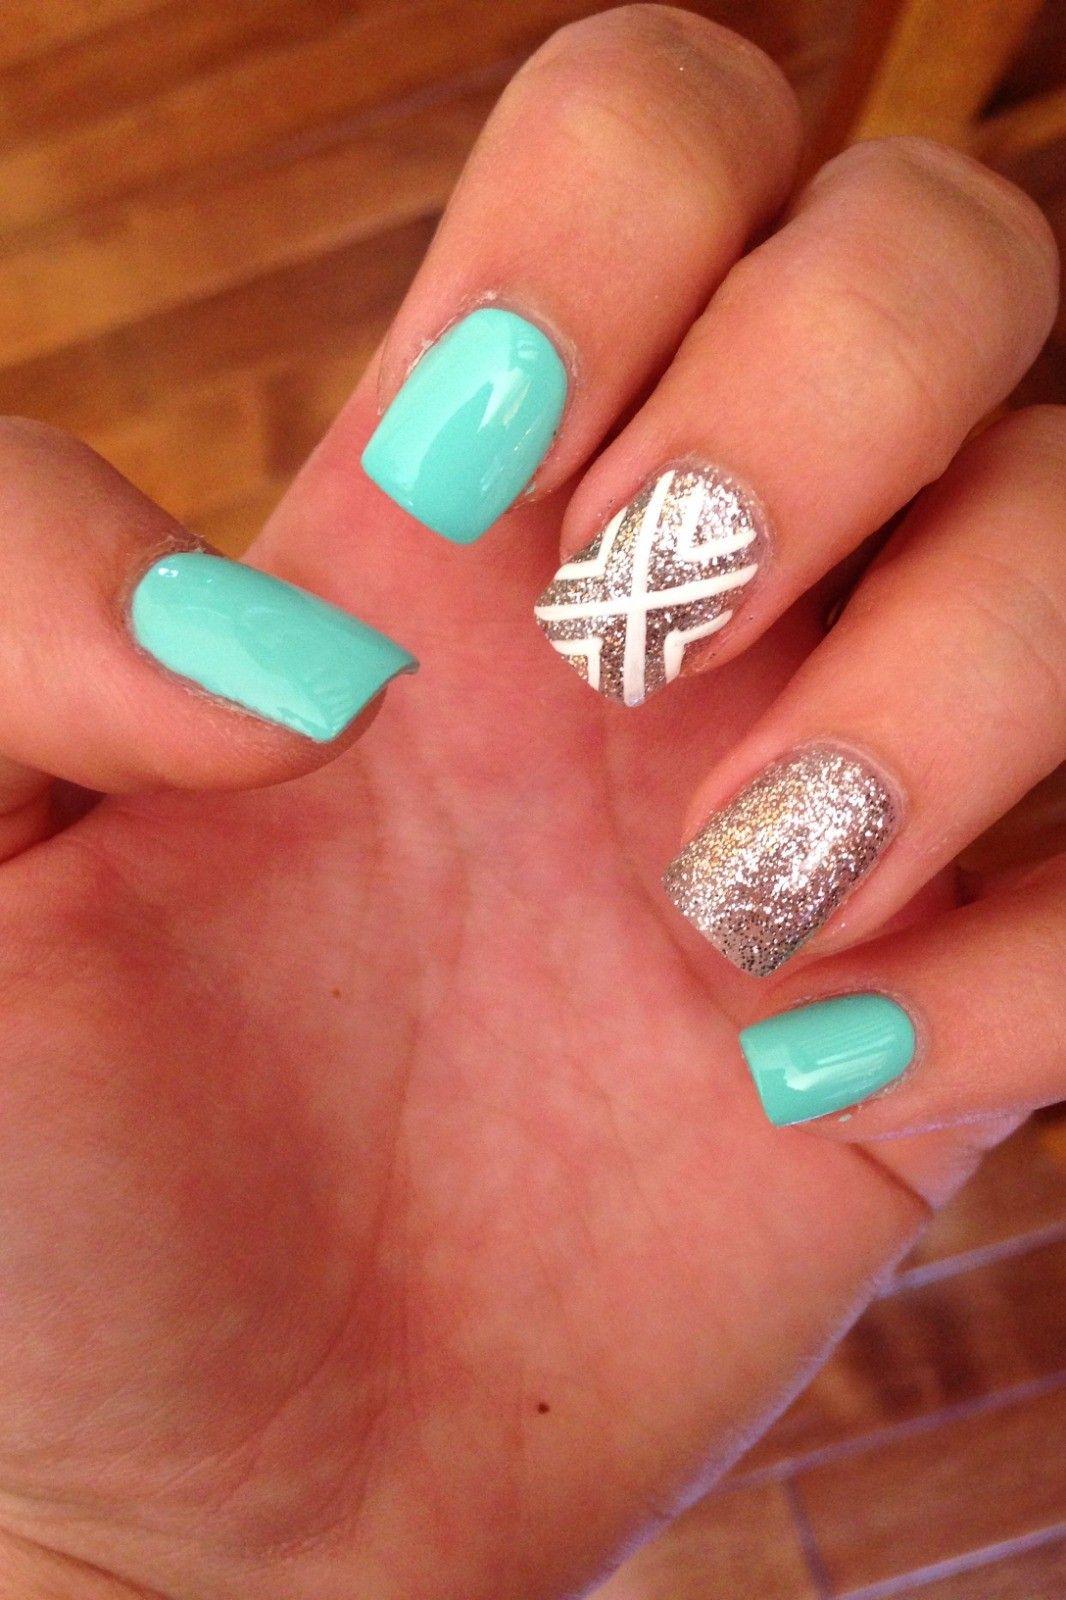 31 Cute Nail Designs In 2020 Short Acrylic Nails Designs Teal Nails Teal Acrylic Nails